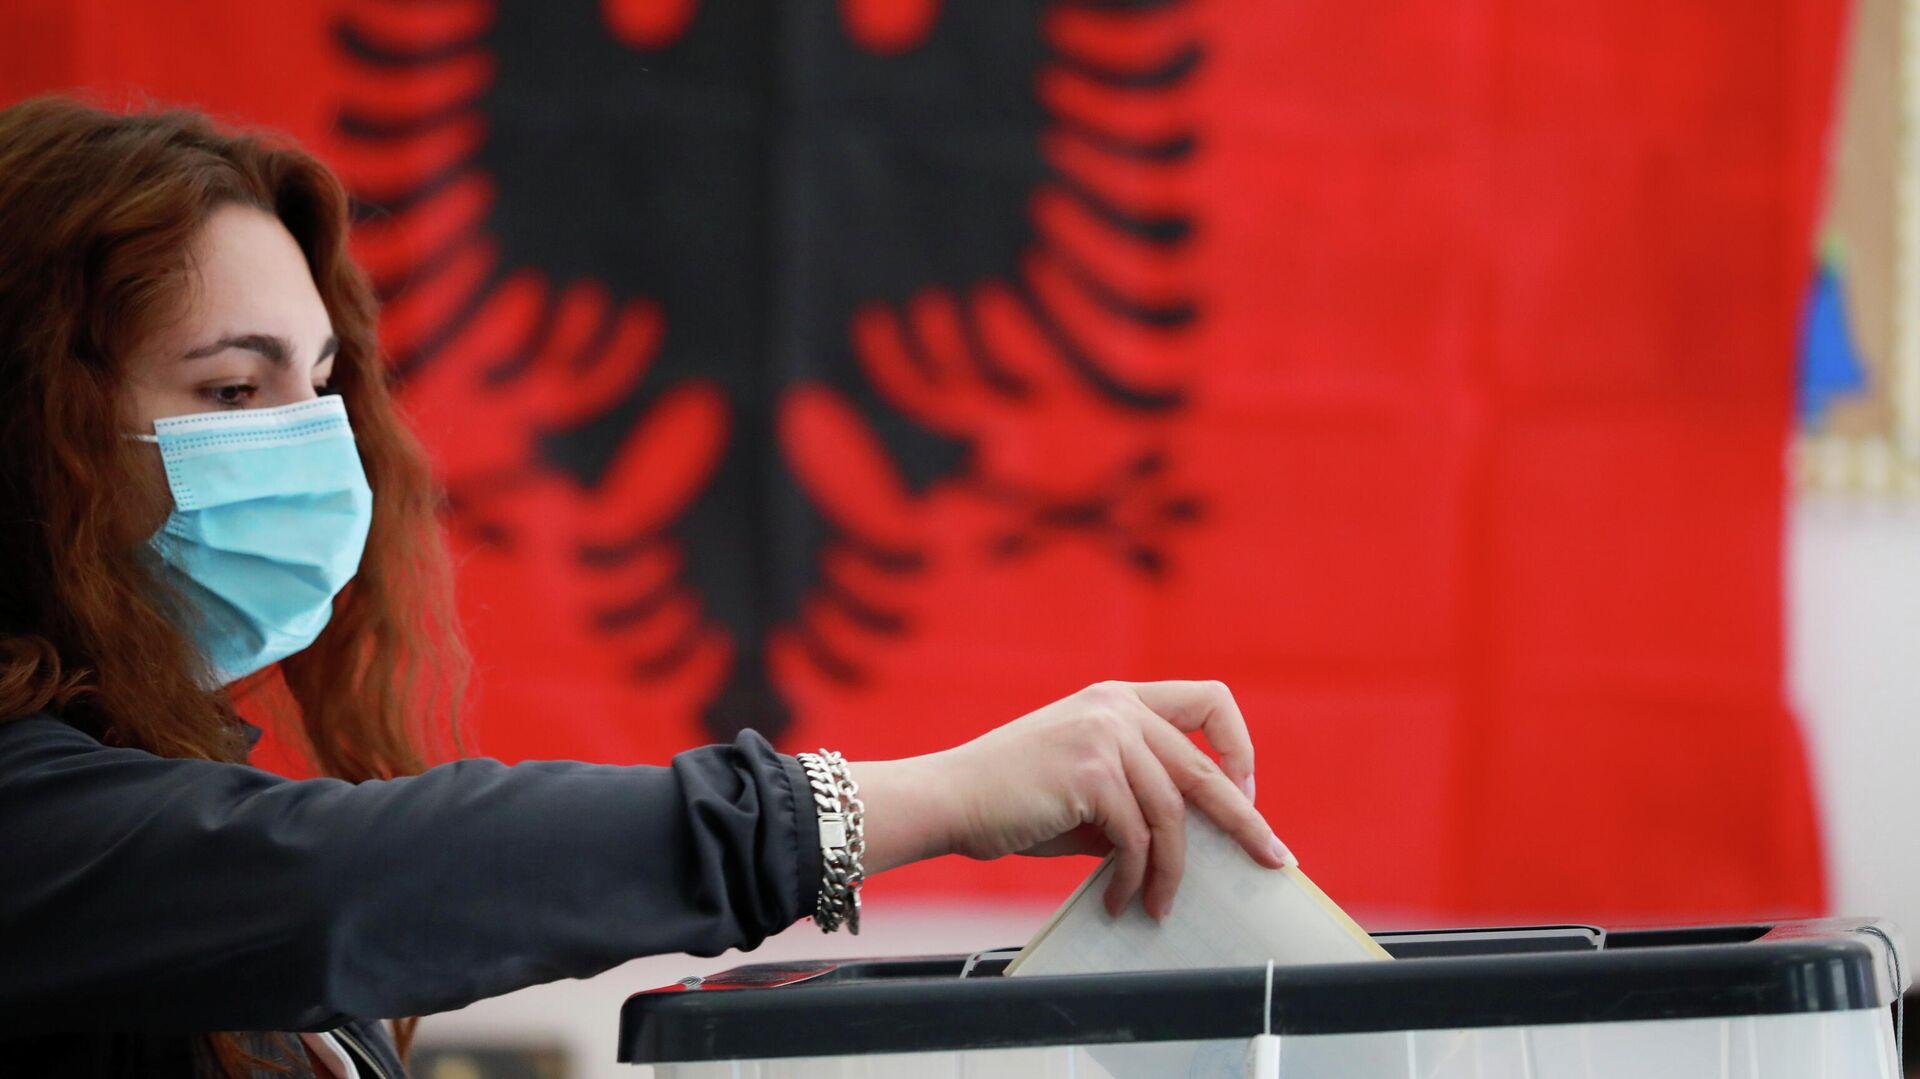 Las elecciones en Albania - Sputnik Mundo, 1920, 25.04.2021